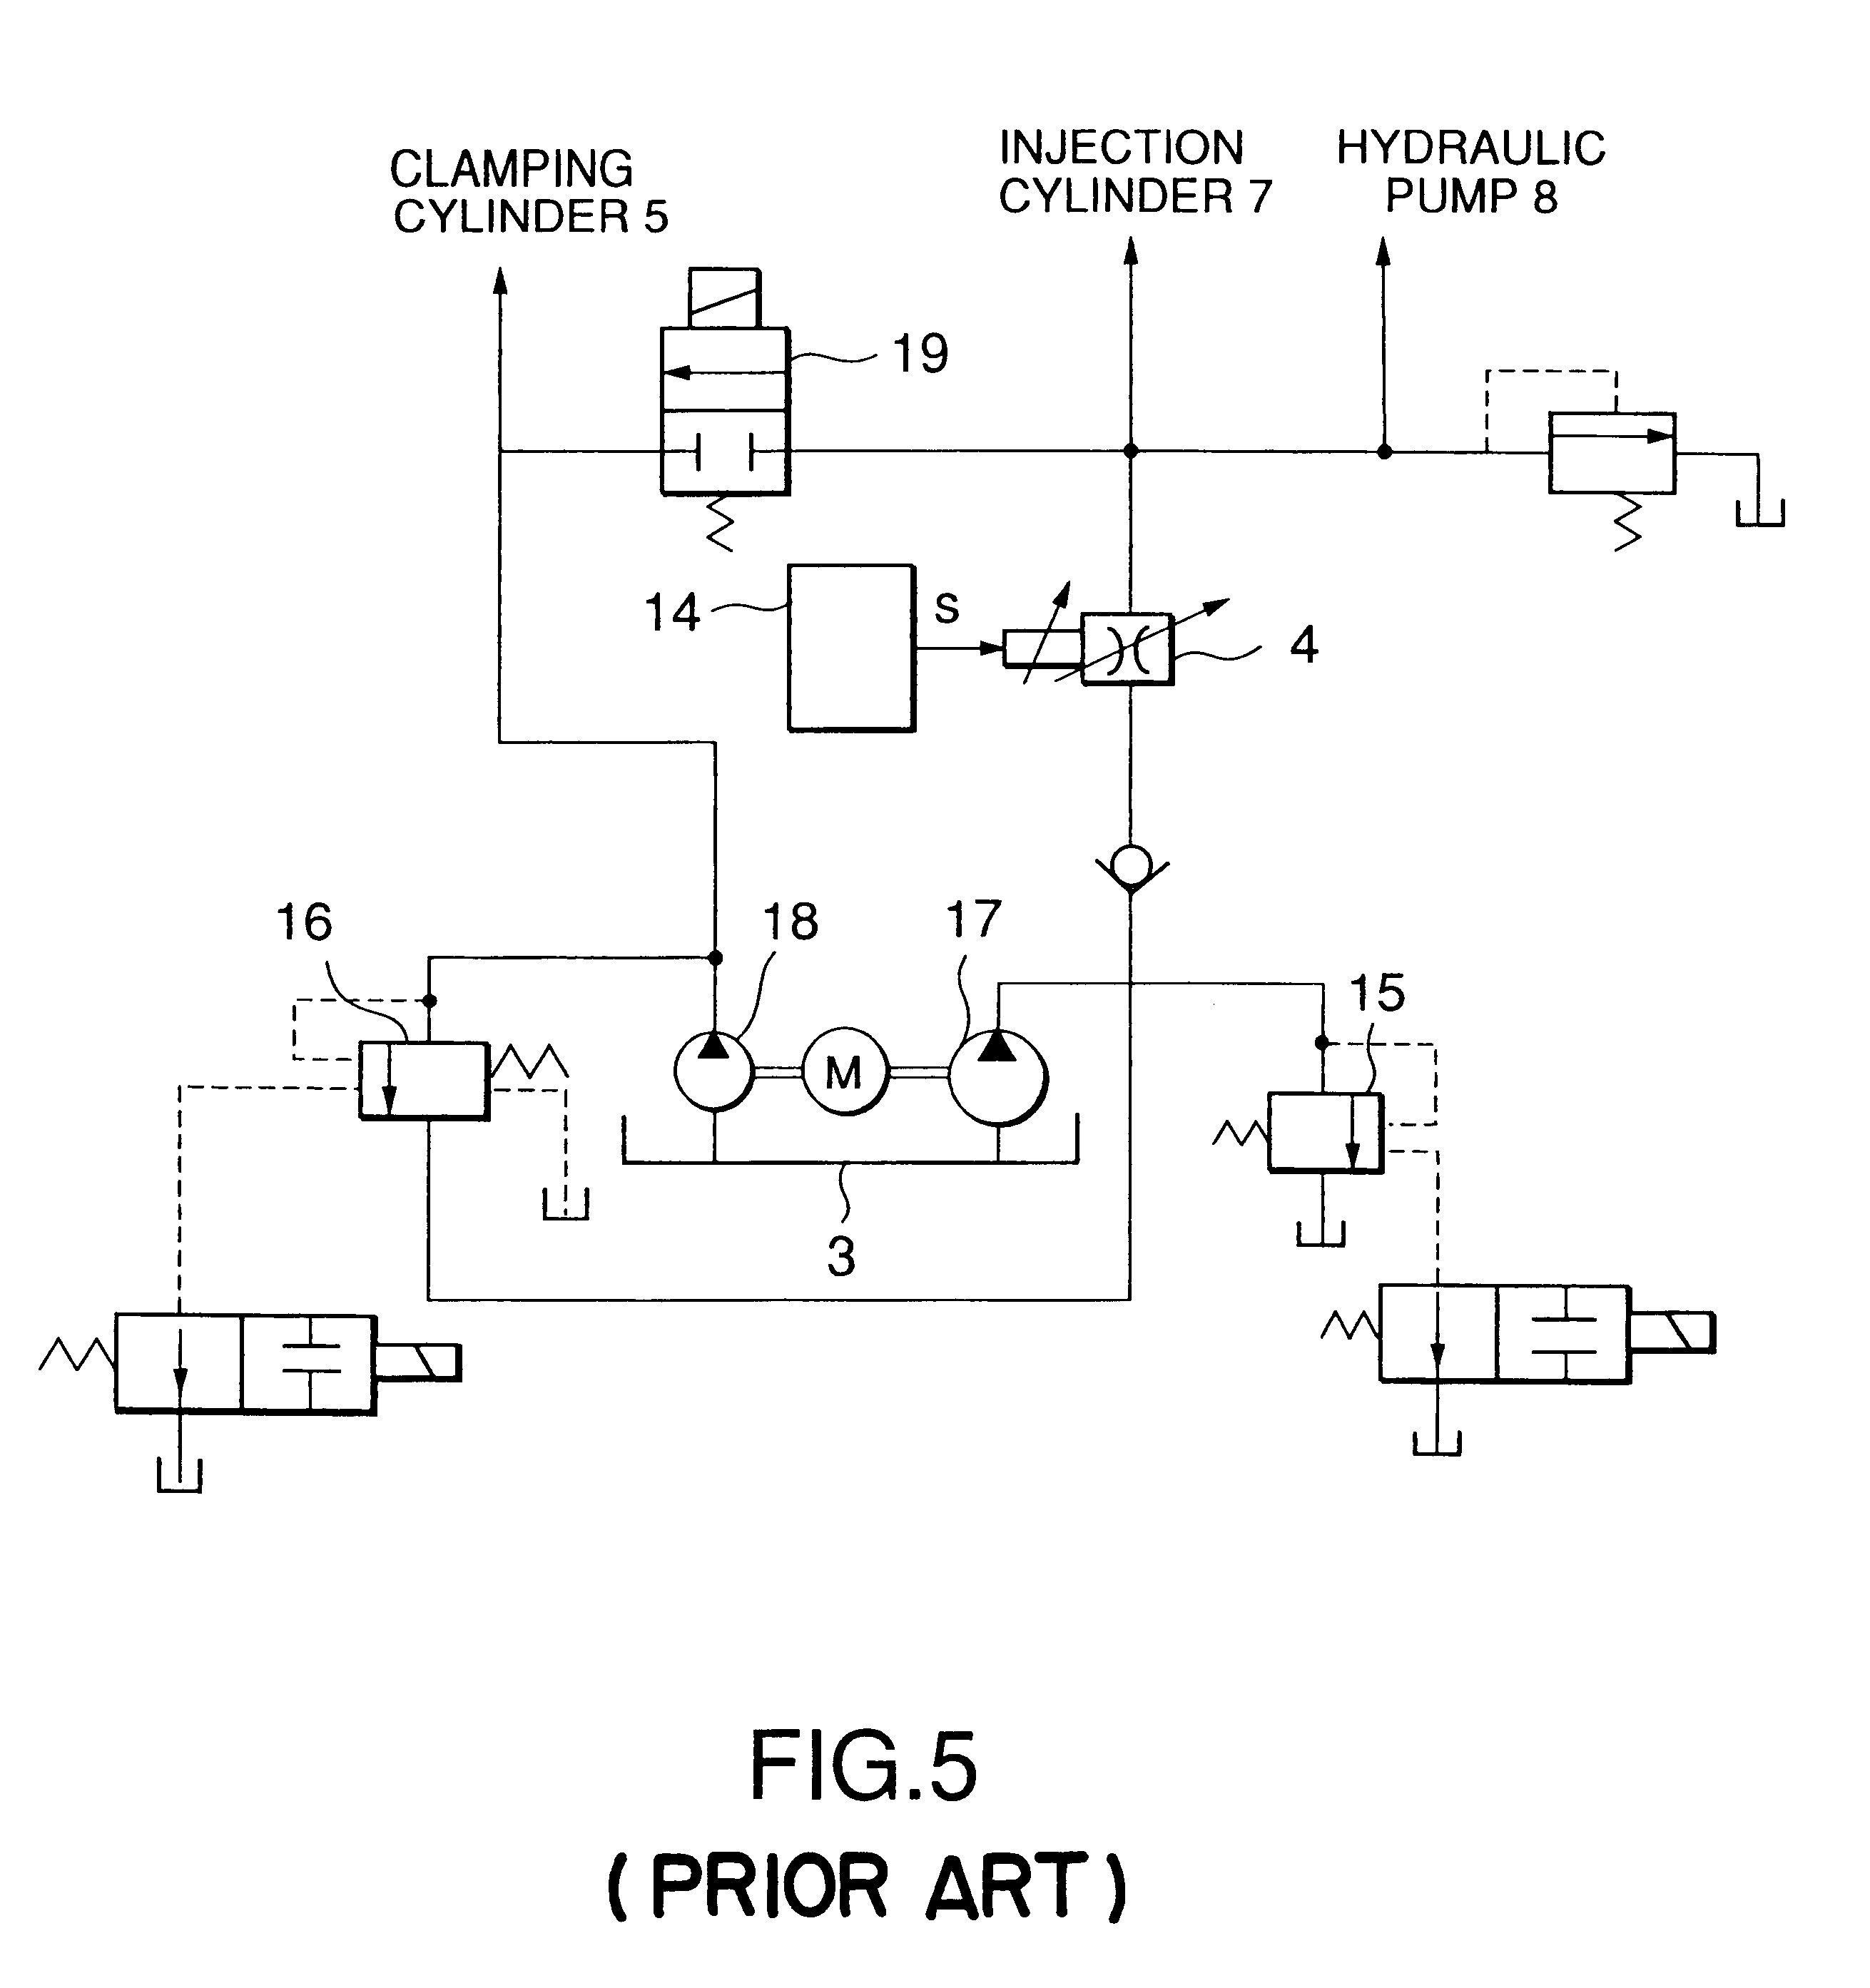 Hydraulic Press Circuit Diagram Pdf Molding Press Wiring Diagram 28 Wiring Diagram In 2020 Hydraulic Circuit Diagram Diagram